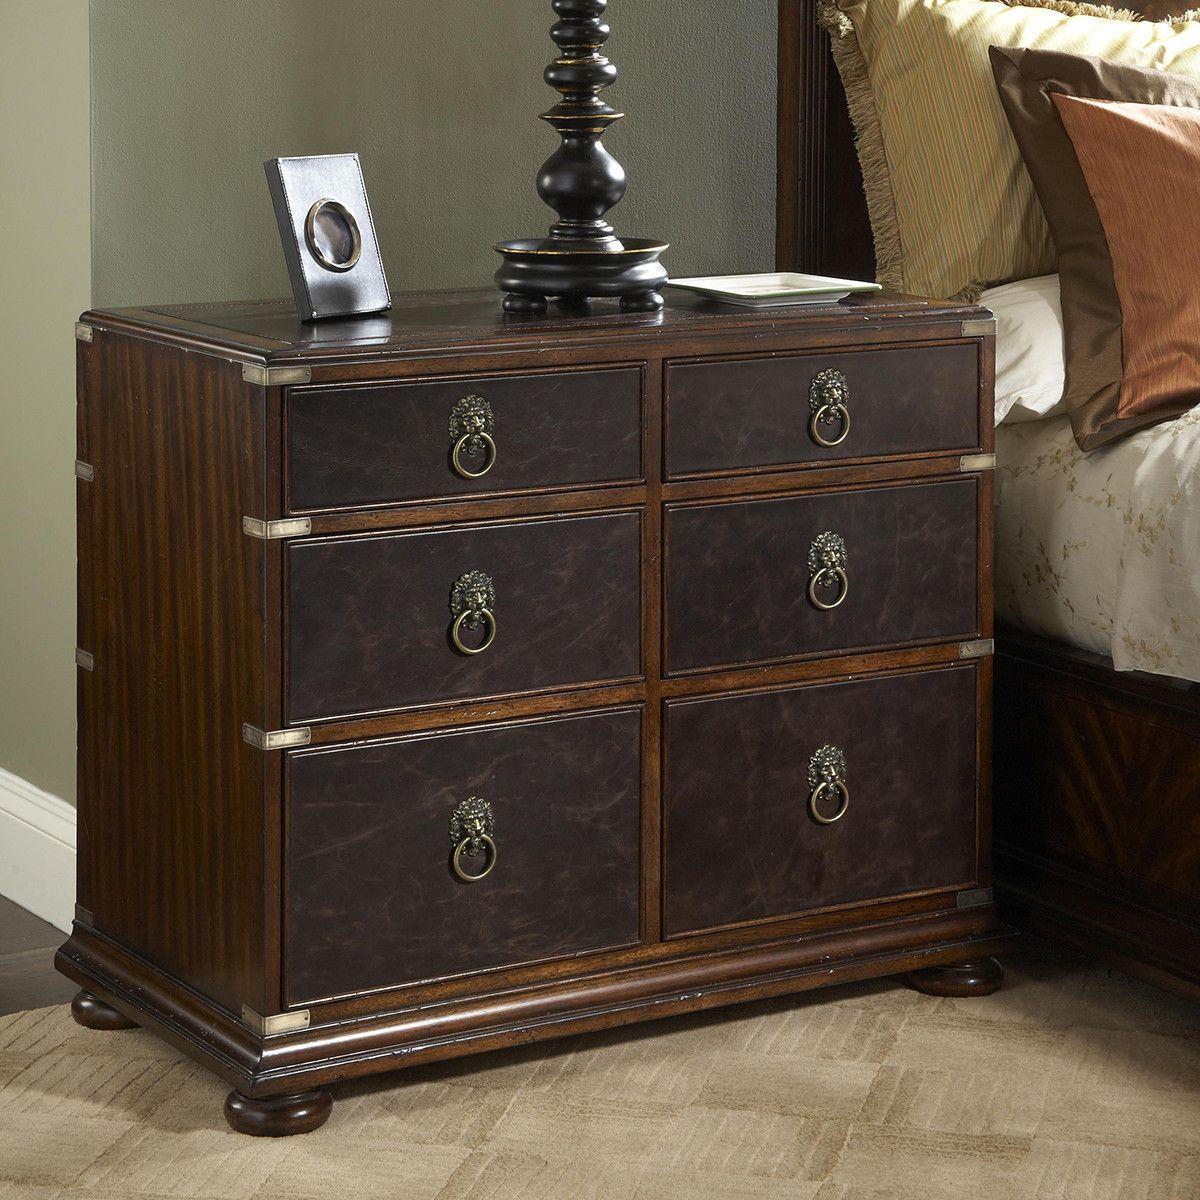 Fine Furniture Design Hyde Park Bachelorus Chest  Fine furniture